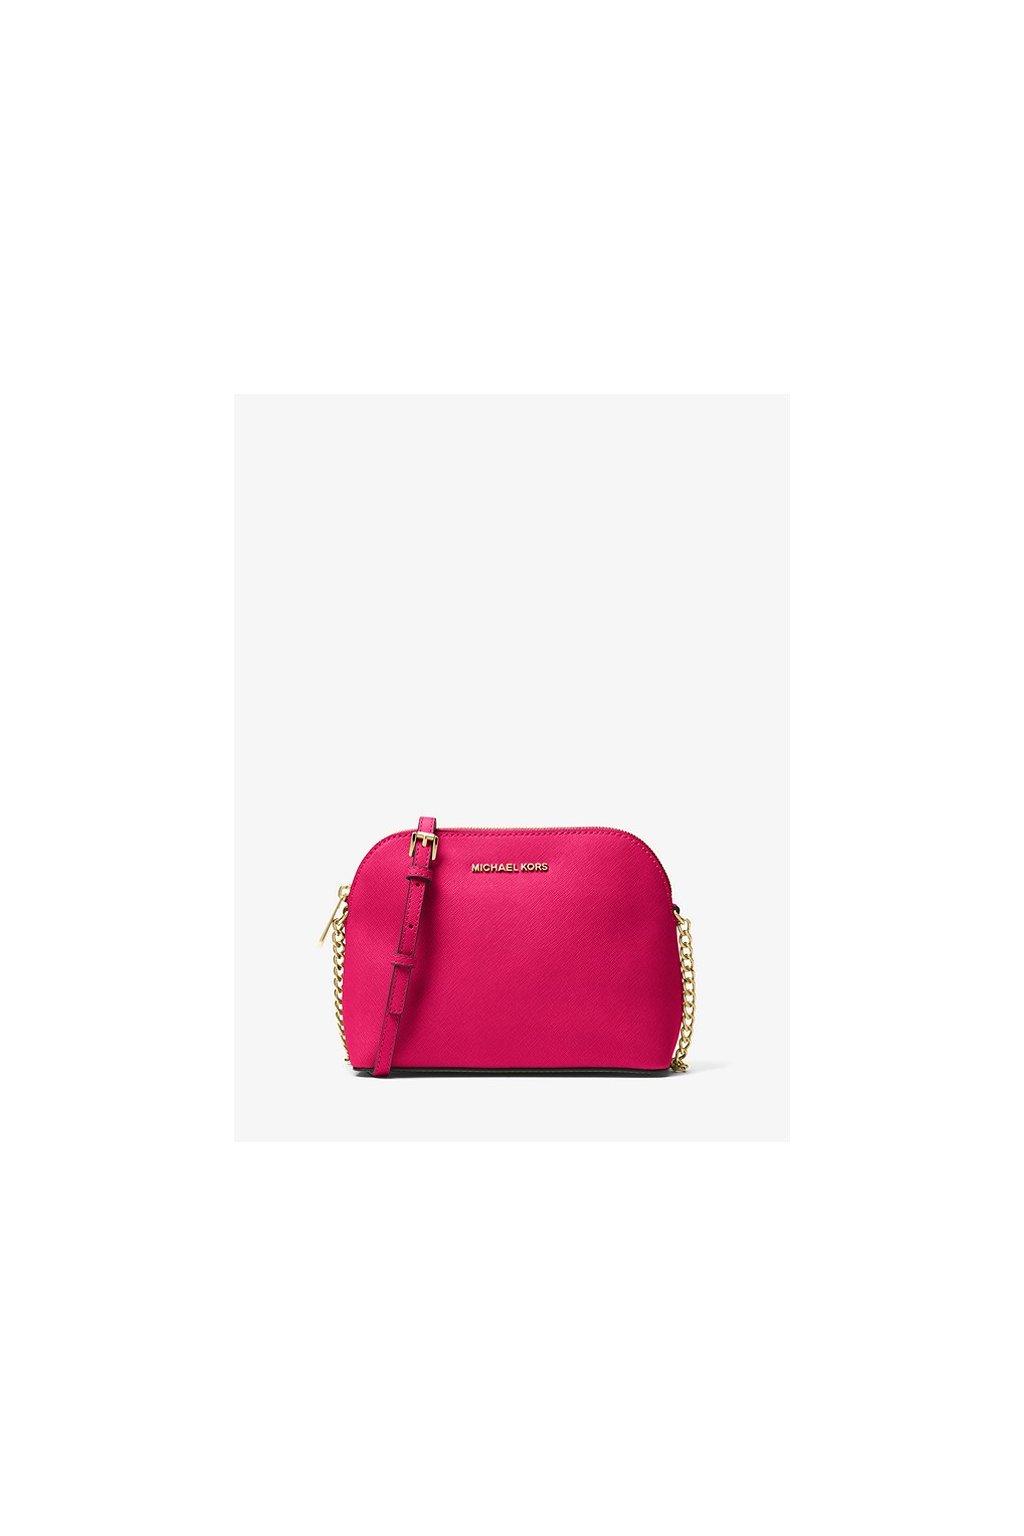 Crossbody Michael Kors Cindy Large Saffiano Leather Crossbody Ultra Pink eshopat cz 1